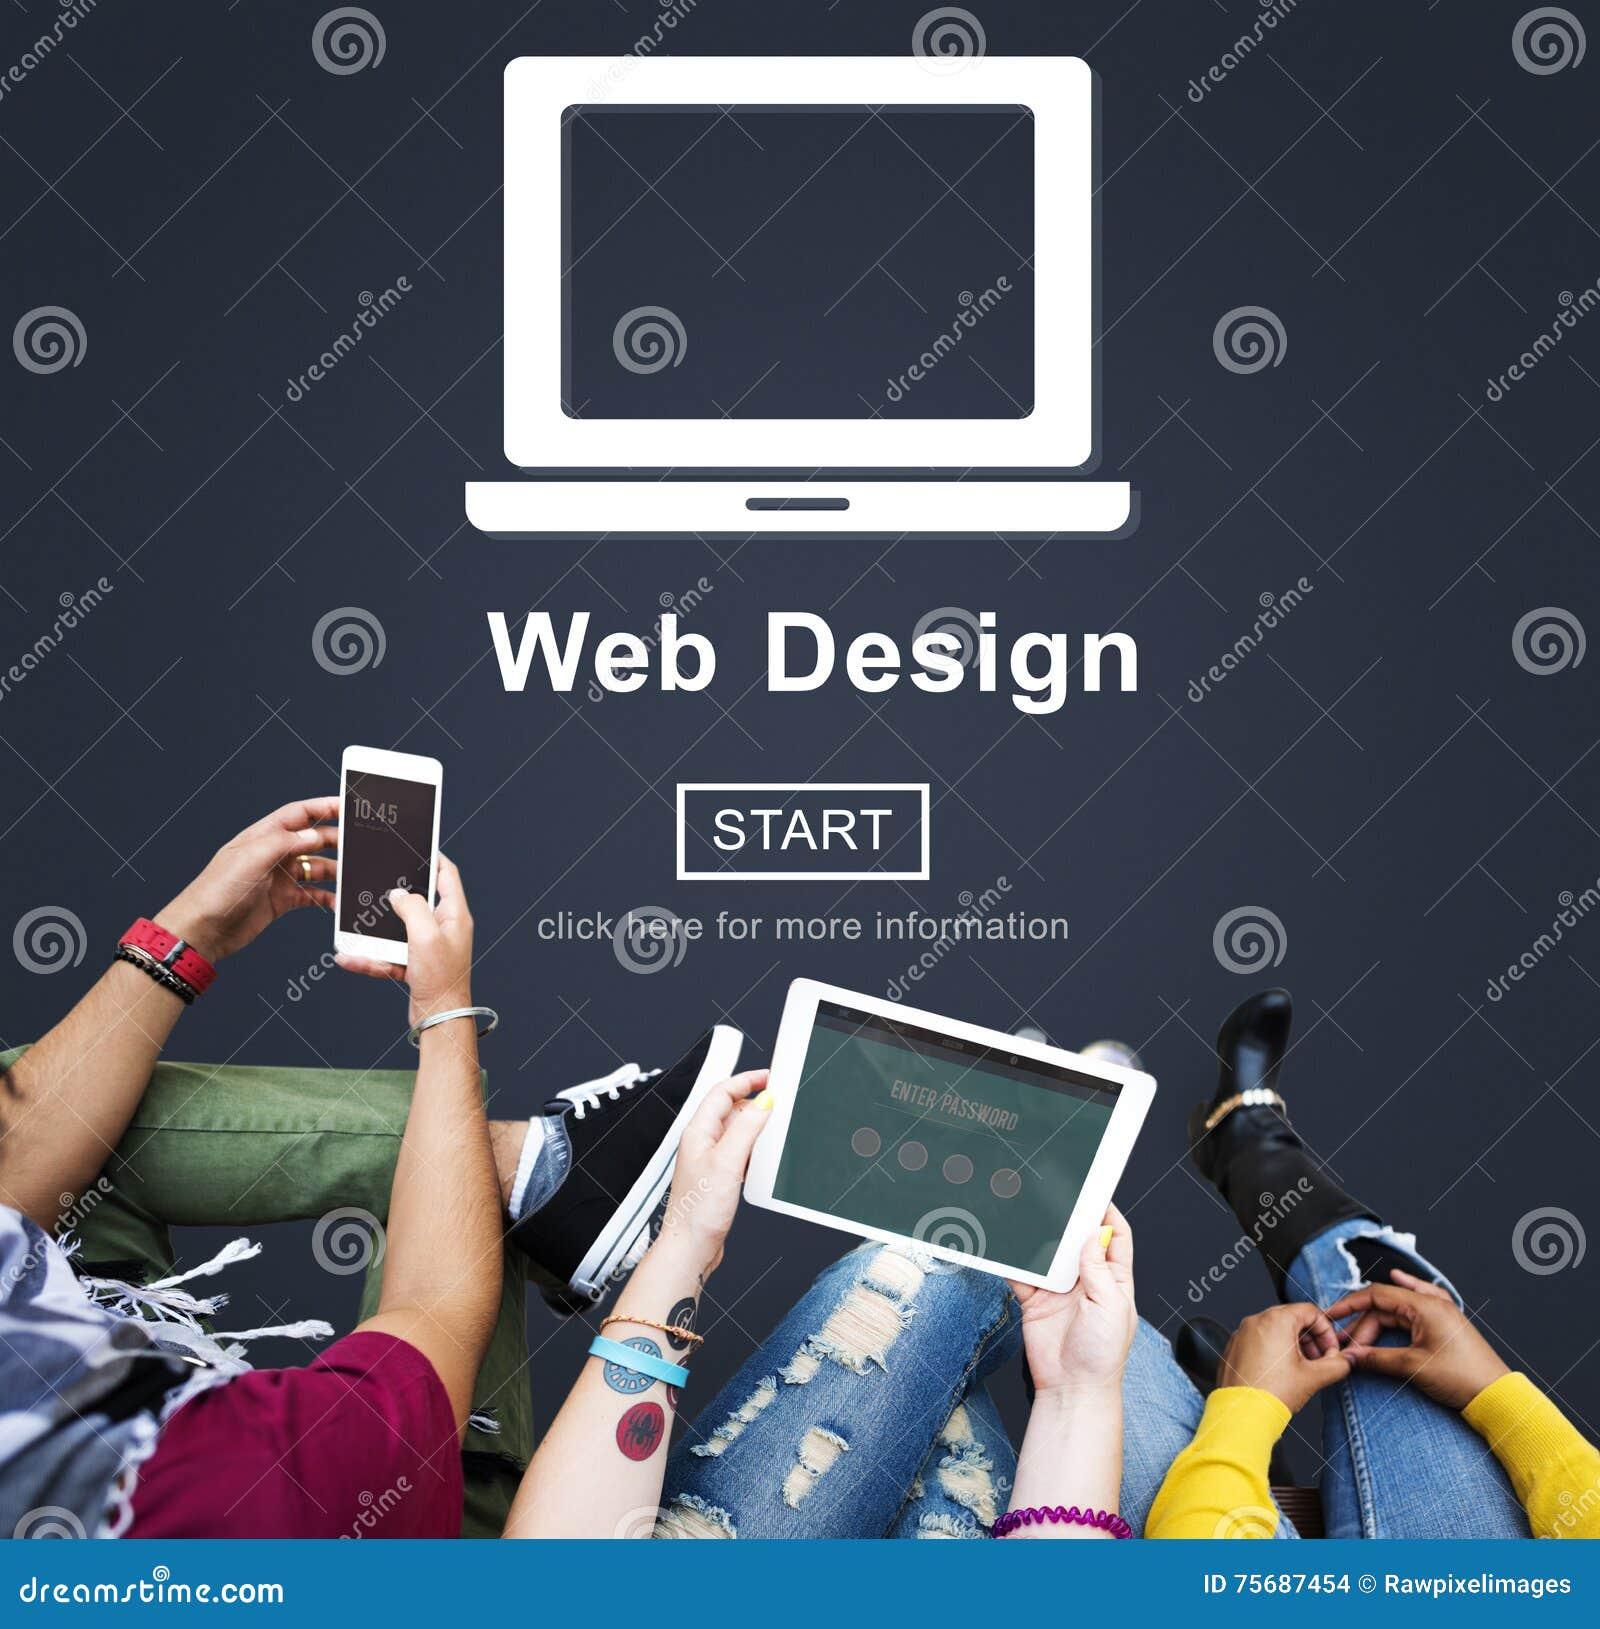 Web Design Homepage Internet layout Software Concept